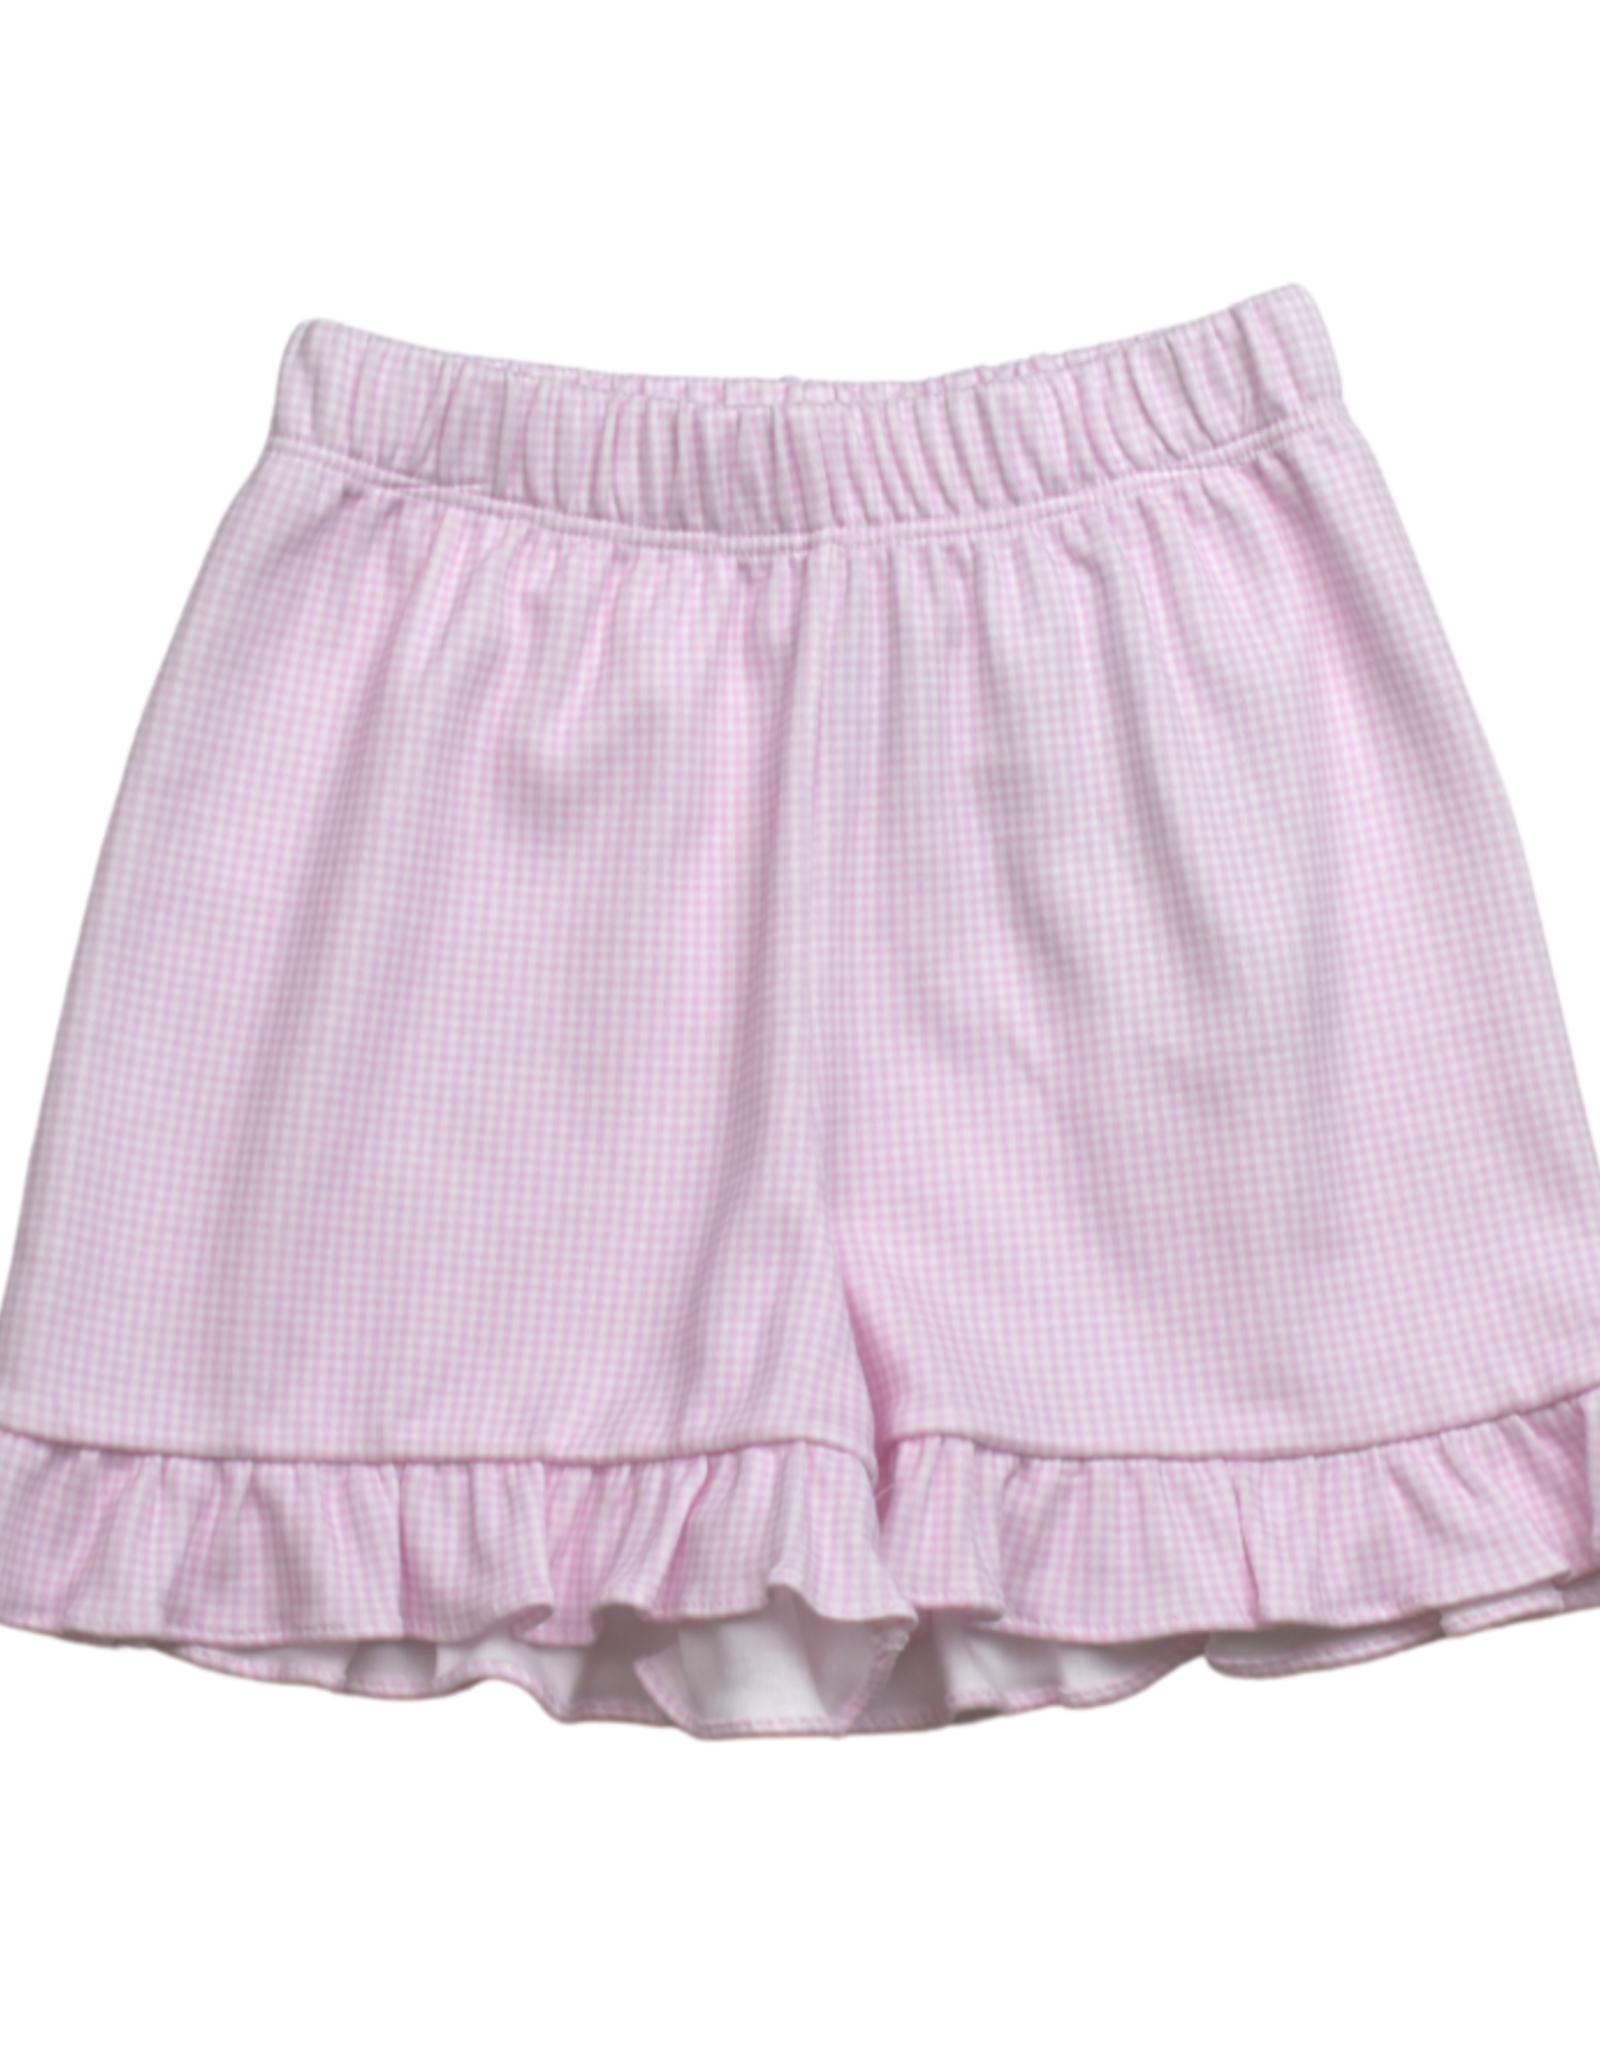 LullabySet Charlotte Shorts, Pink Mini Gingham Pima